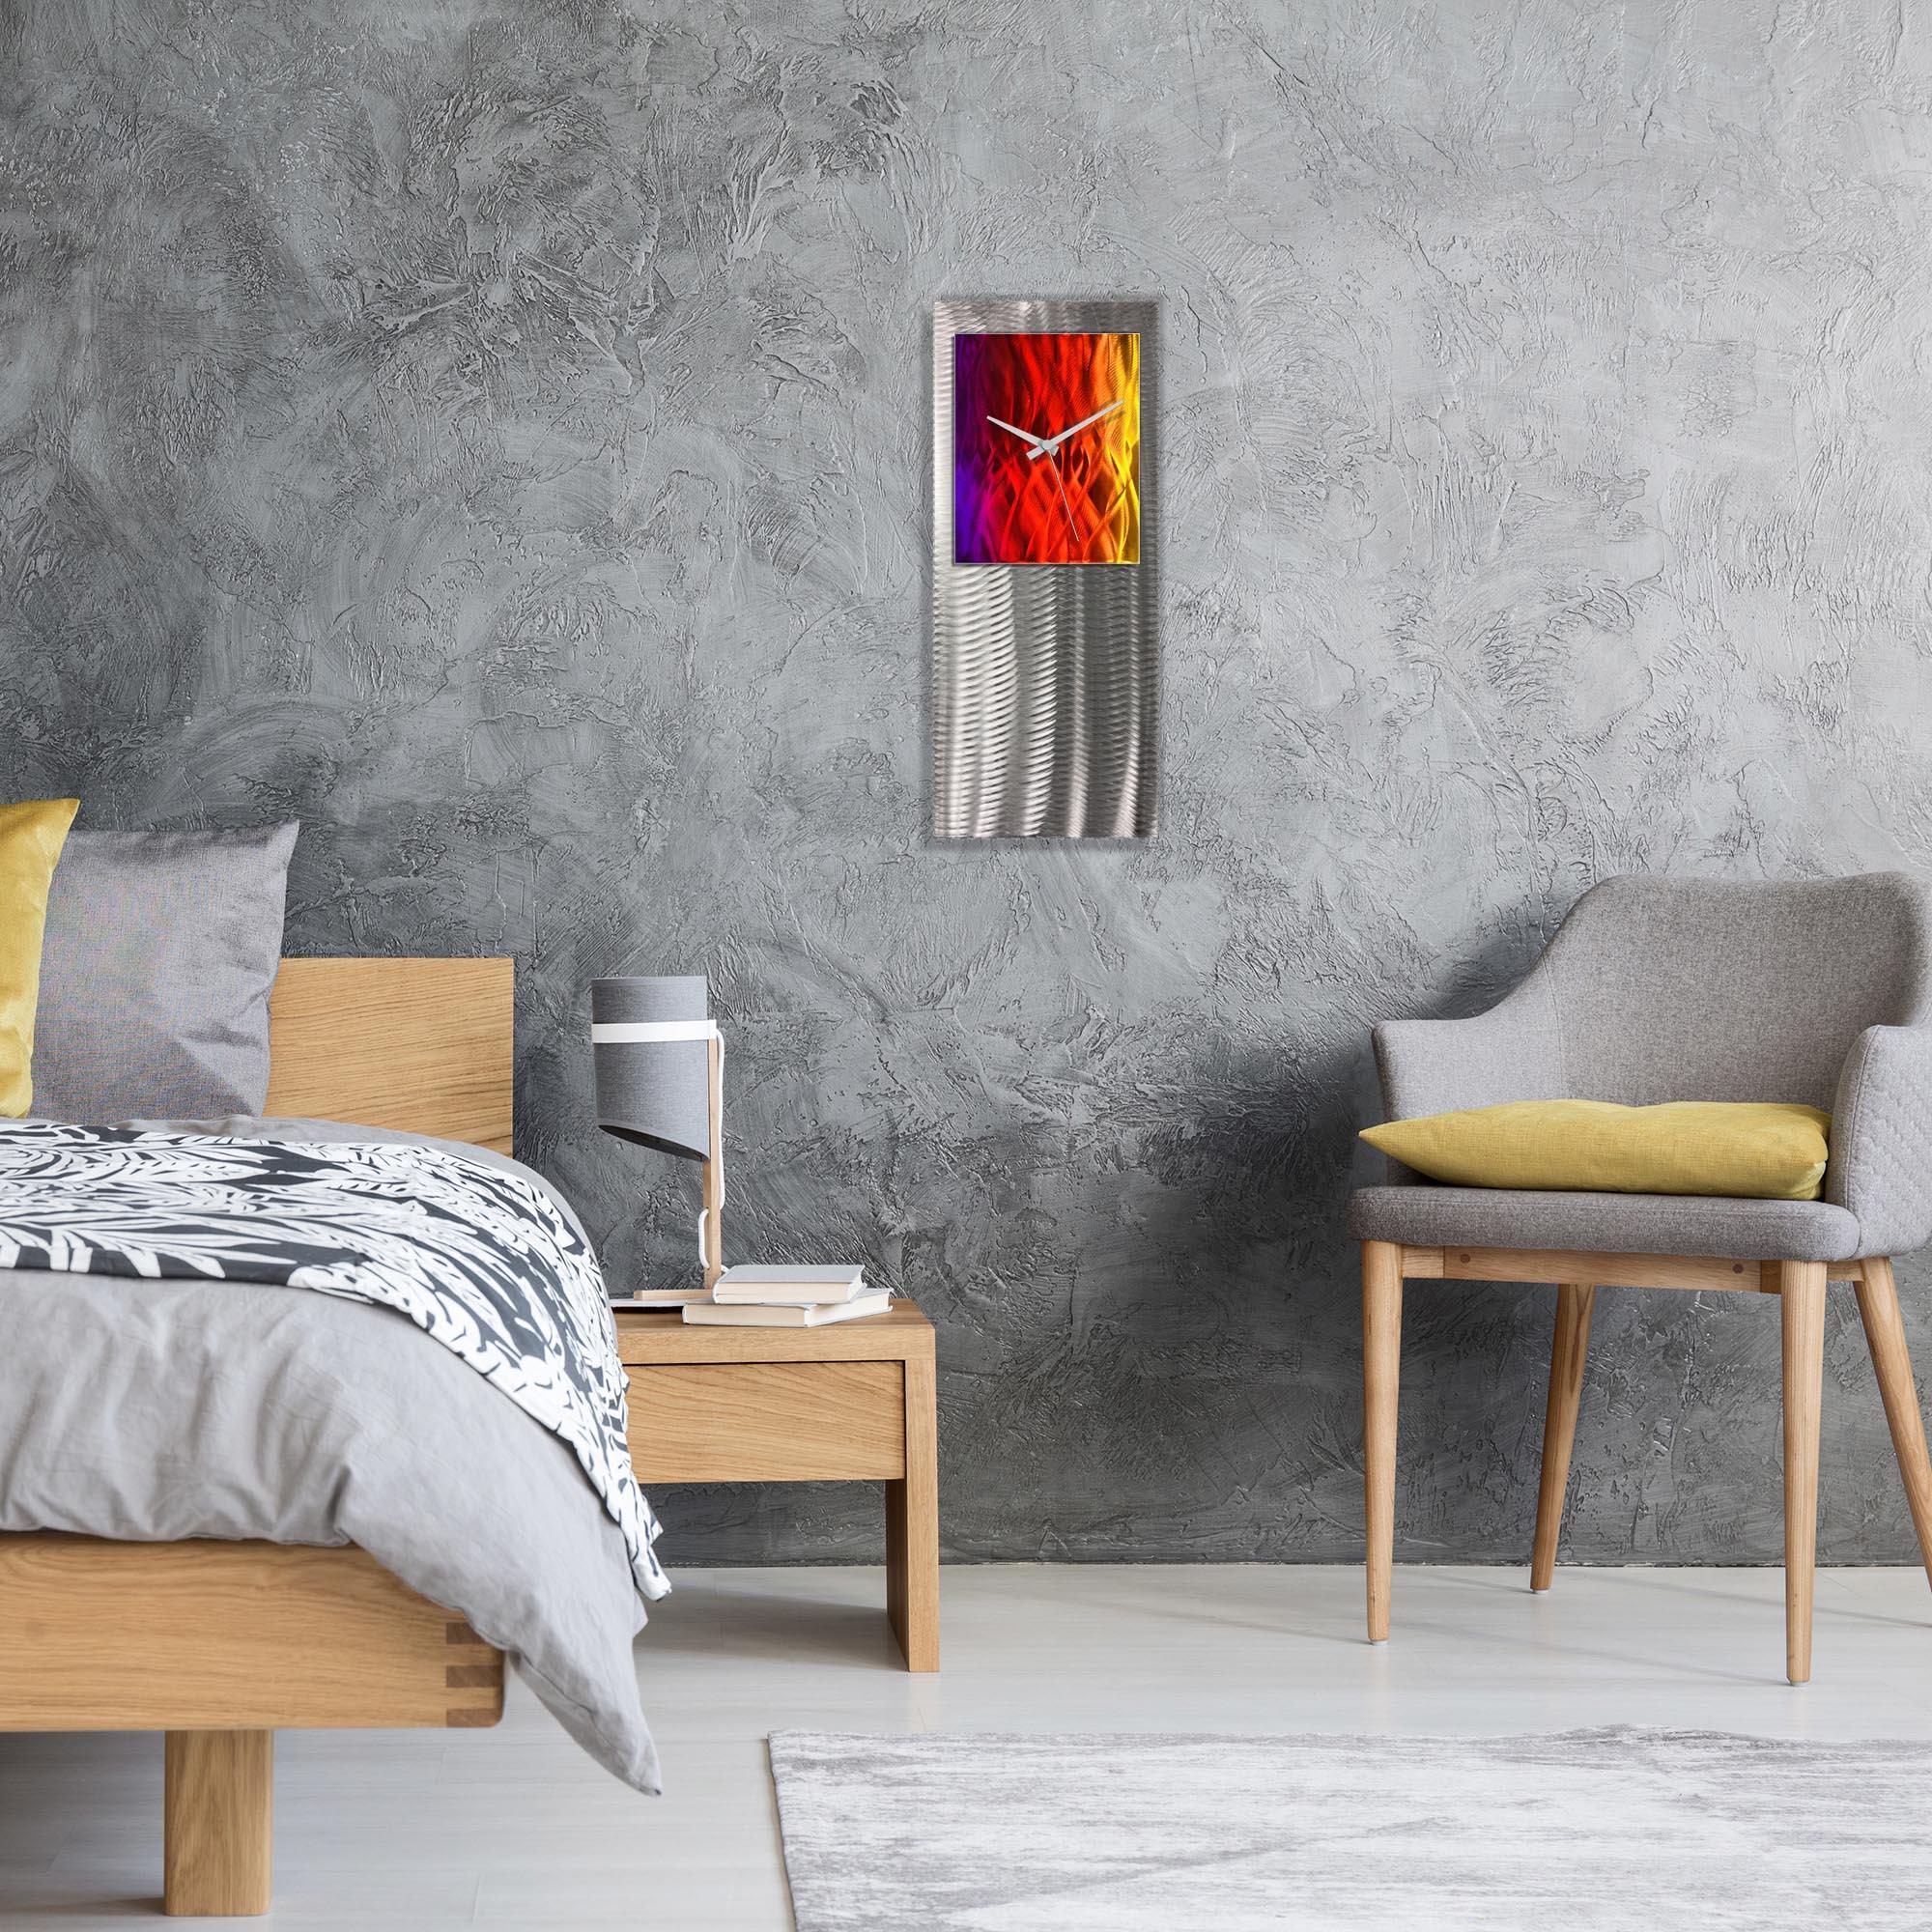 Metal Art Studio Abstract Decor Sunrise Studio Clock 10in x 24in - Lifestyle View